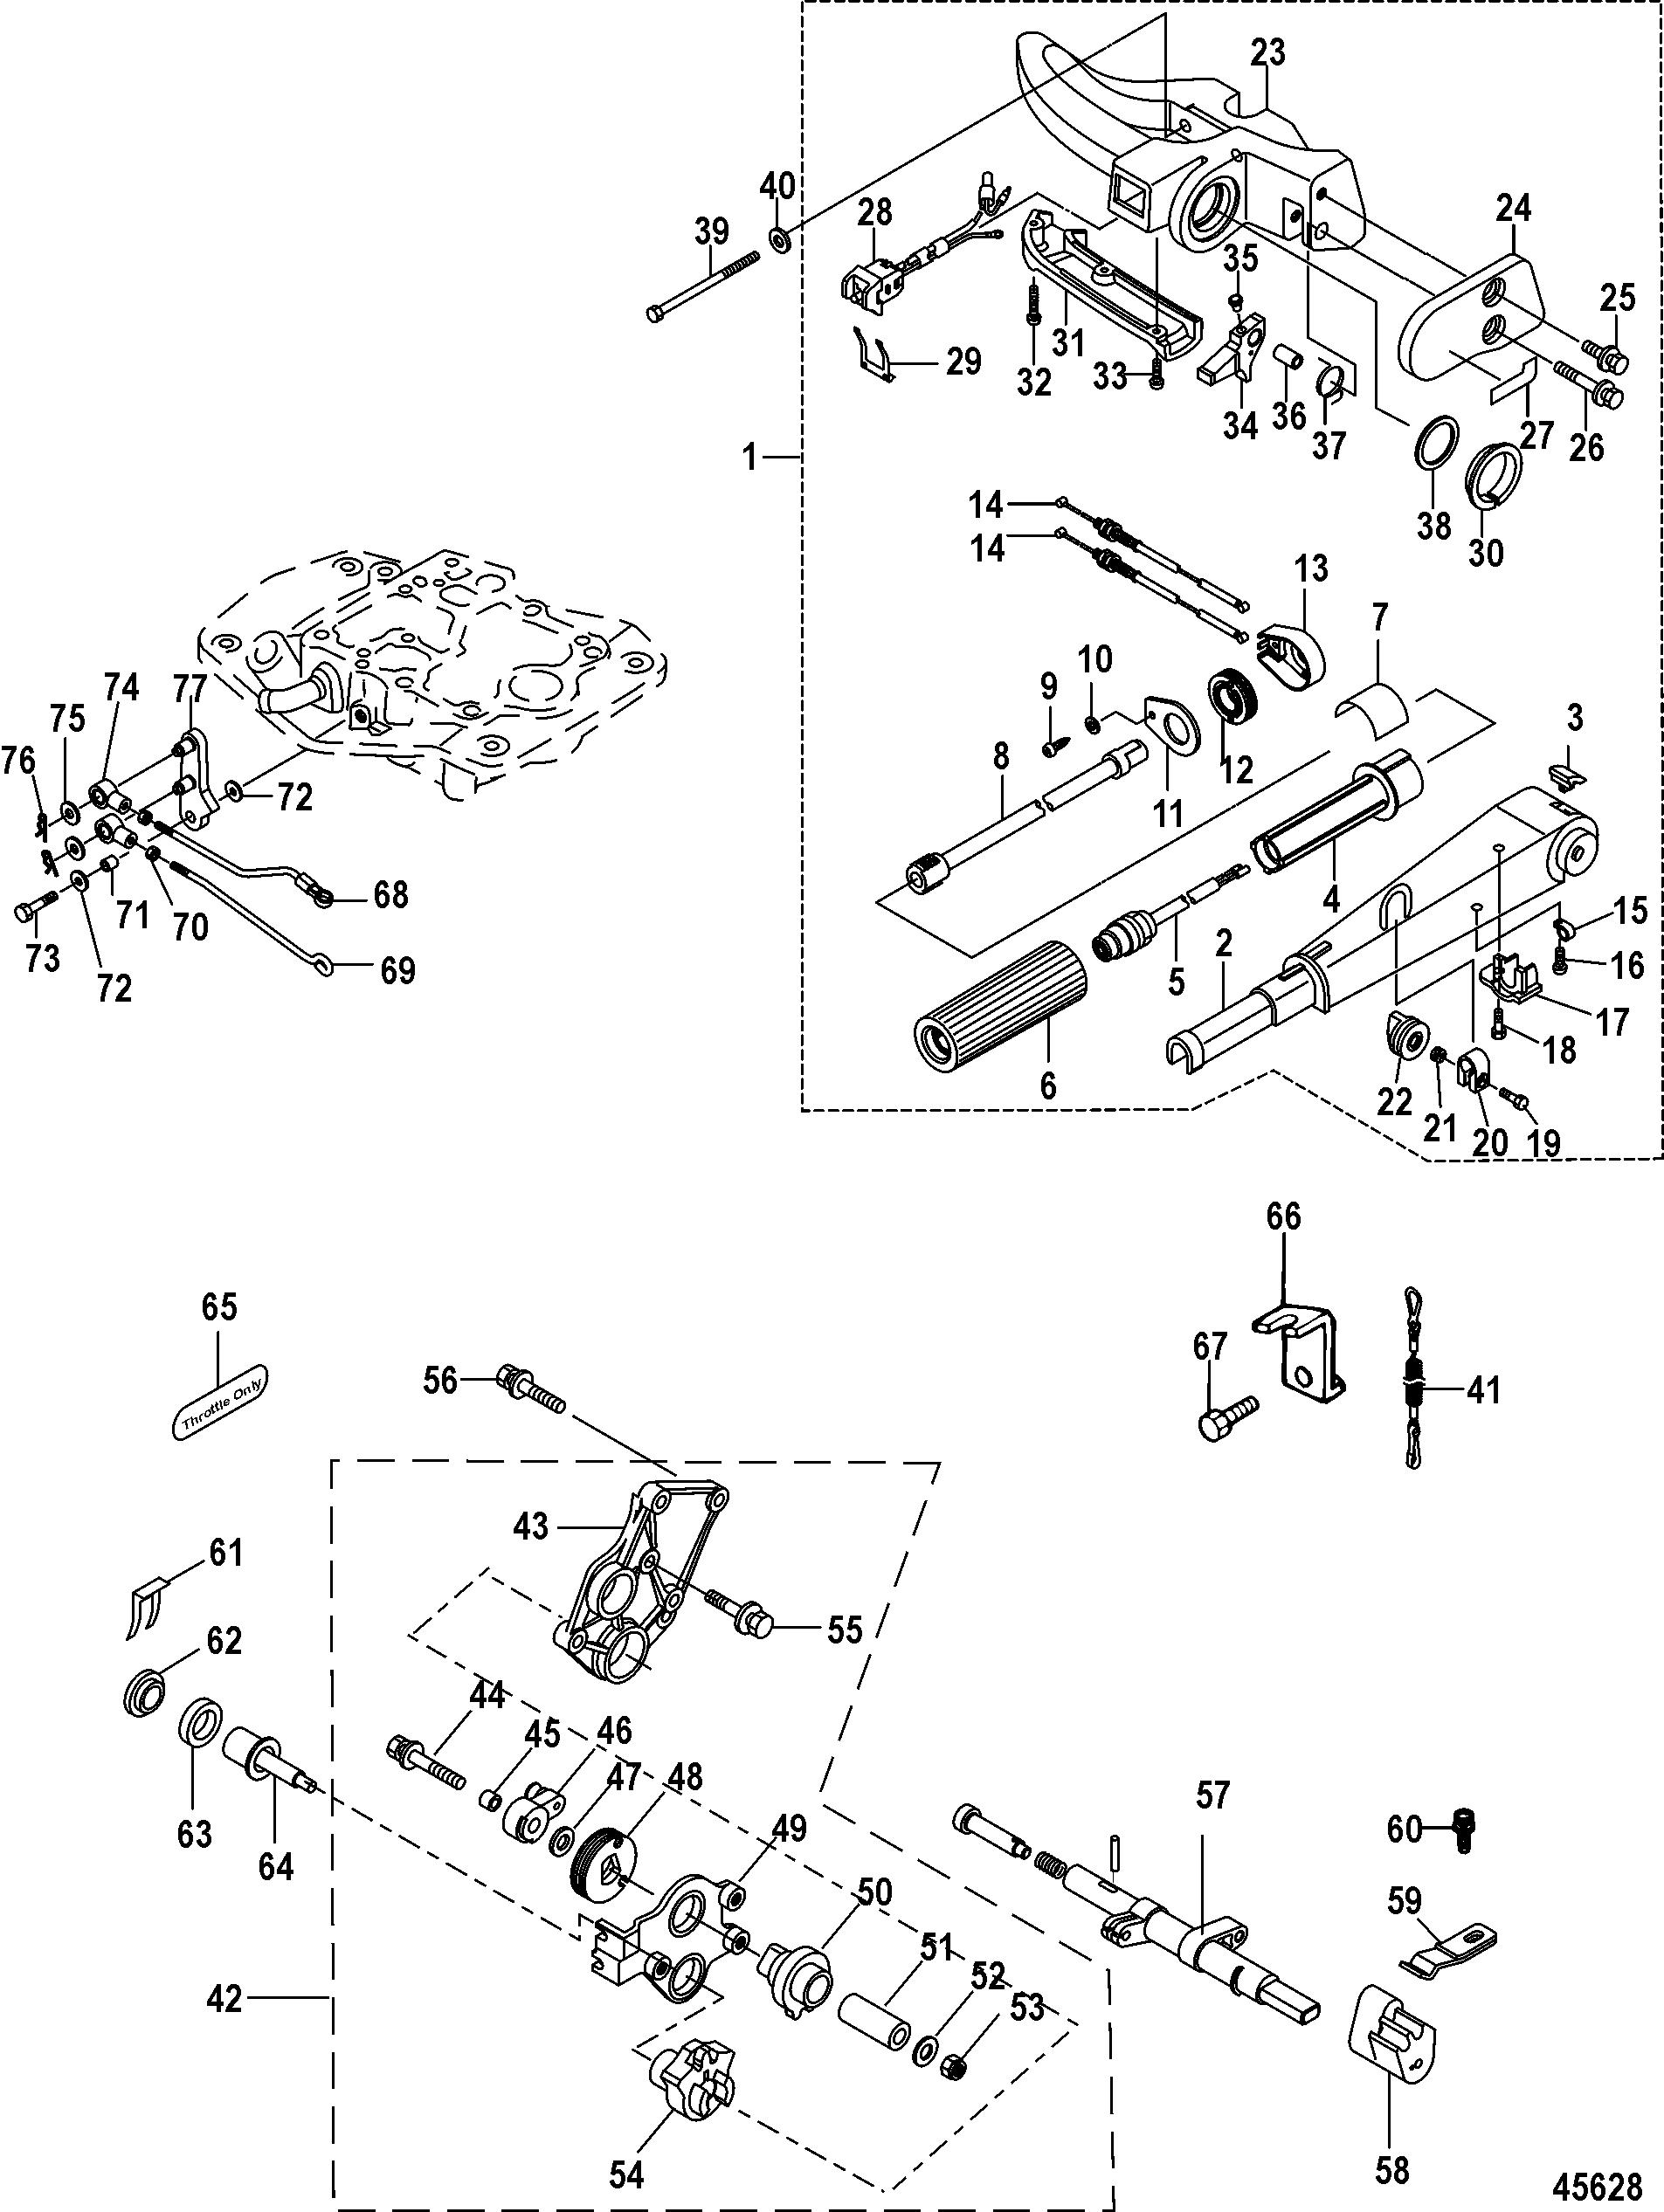 download mercury outboard online factory service repair manual pdf